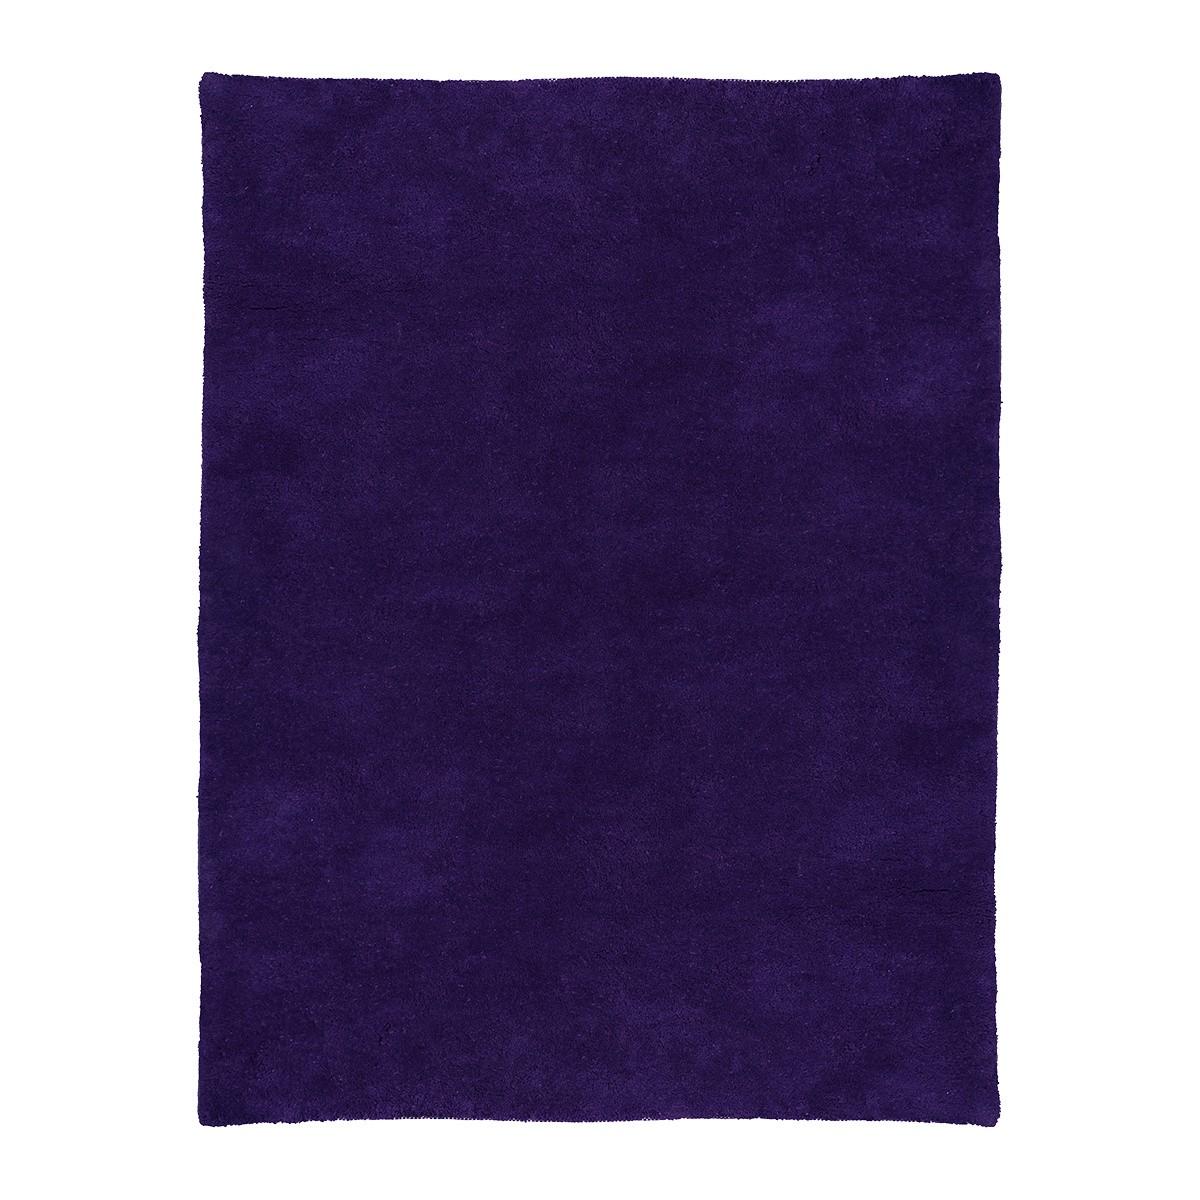 Velluto Rug, Purple 200 x 300